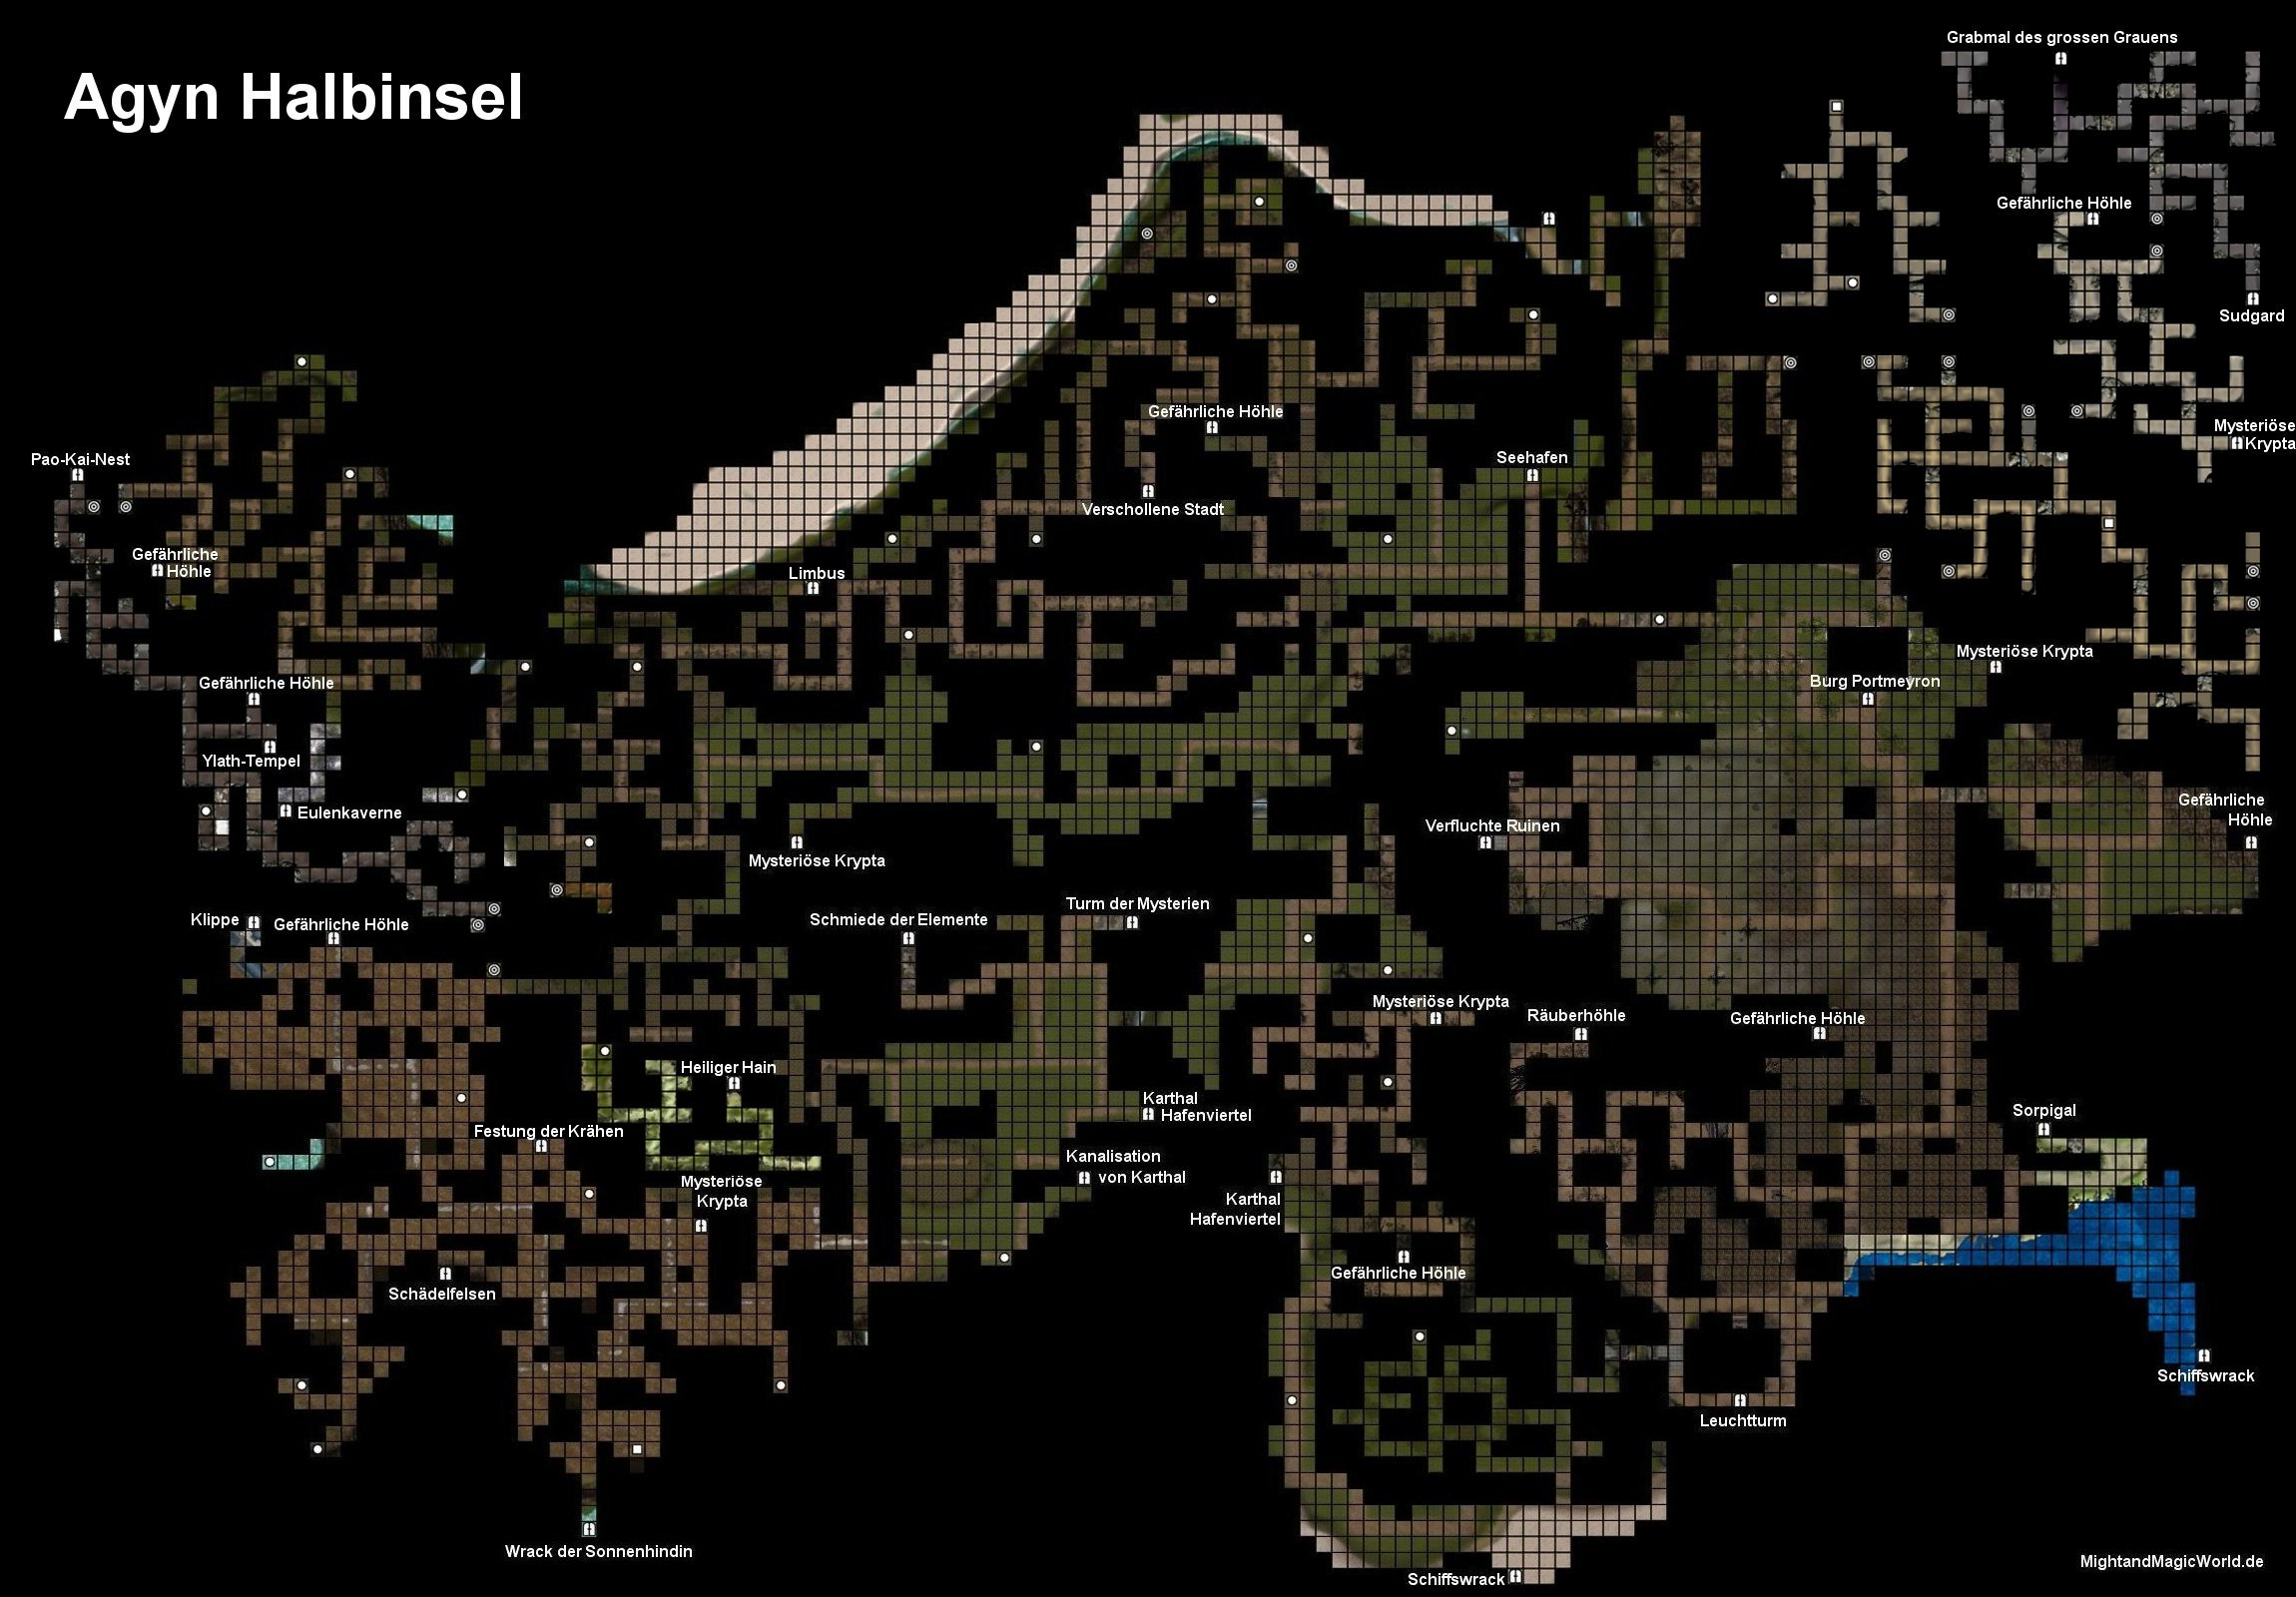 Übersichtskarte der Agyn Halbinsel